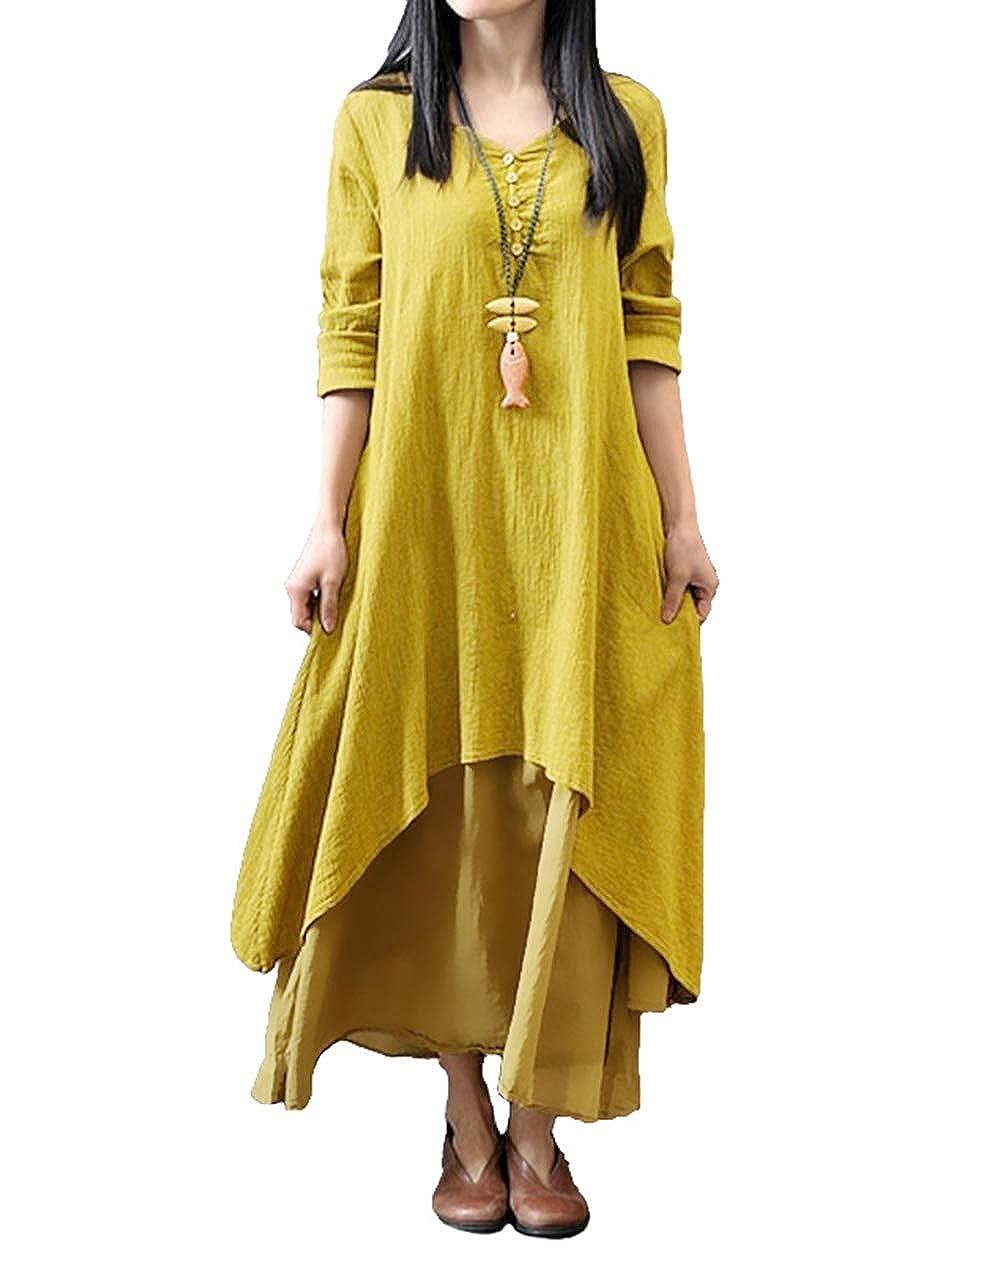 TALLA S. Romacci Vestido Suelto Vestido Ocasional de Las Mujeres Manga Larga Sólida Maxi Vestido Largo de Boho Amarillo